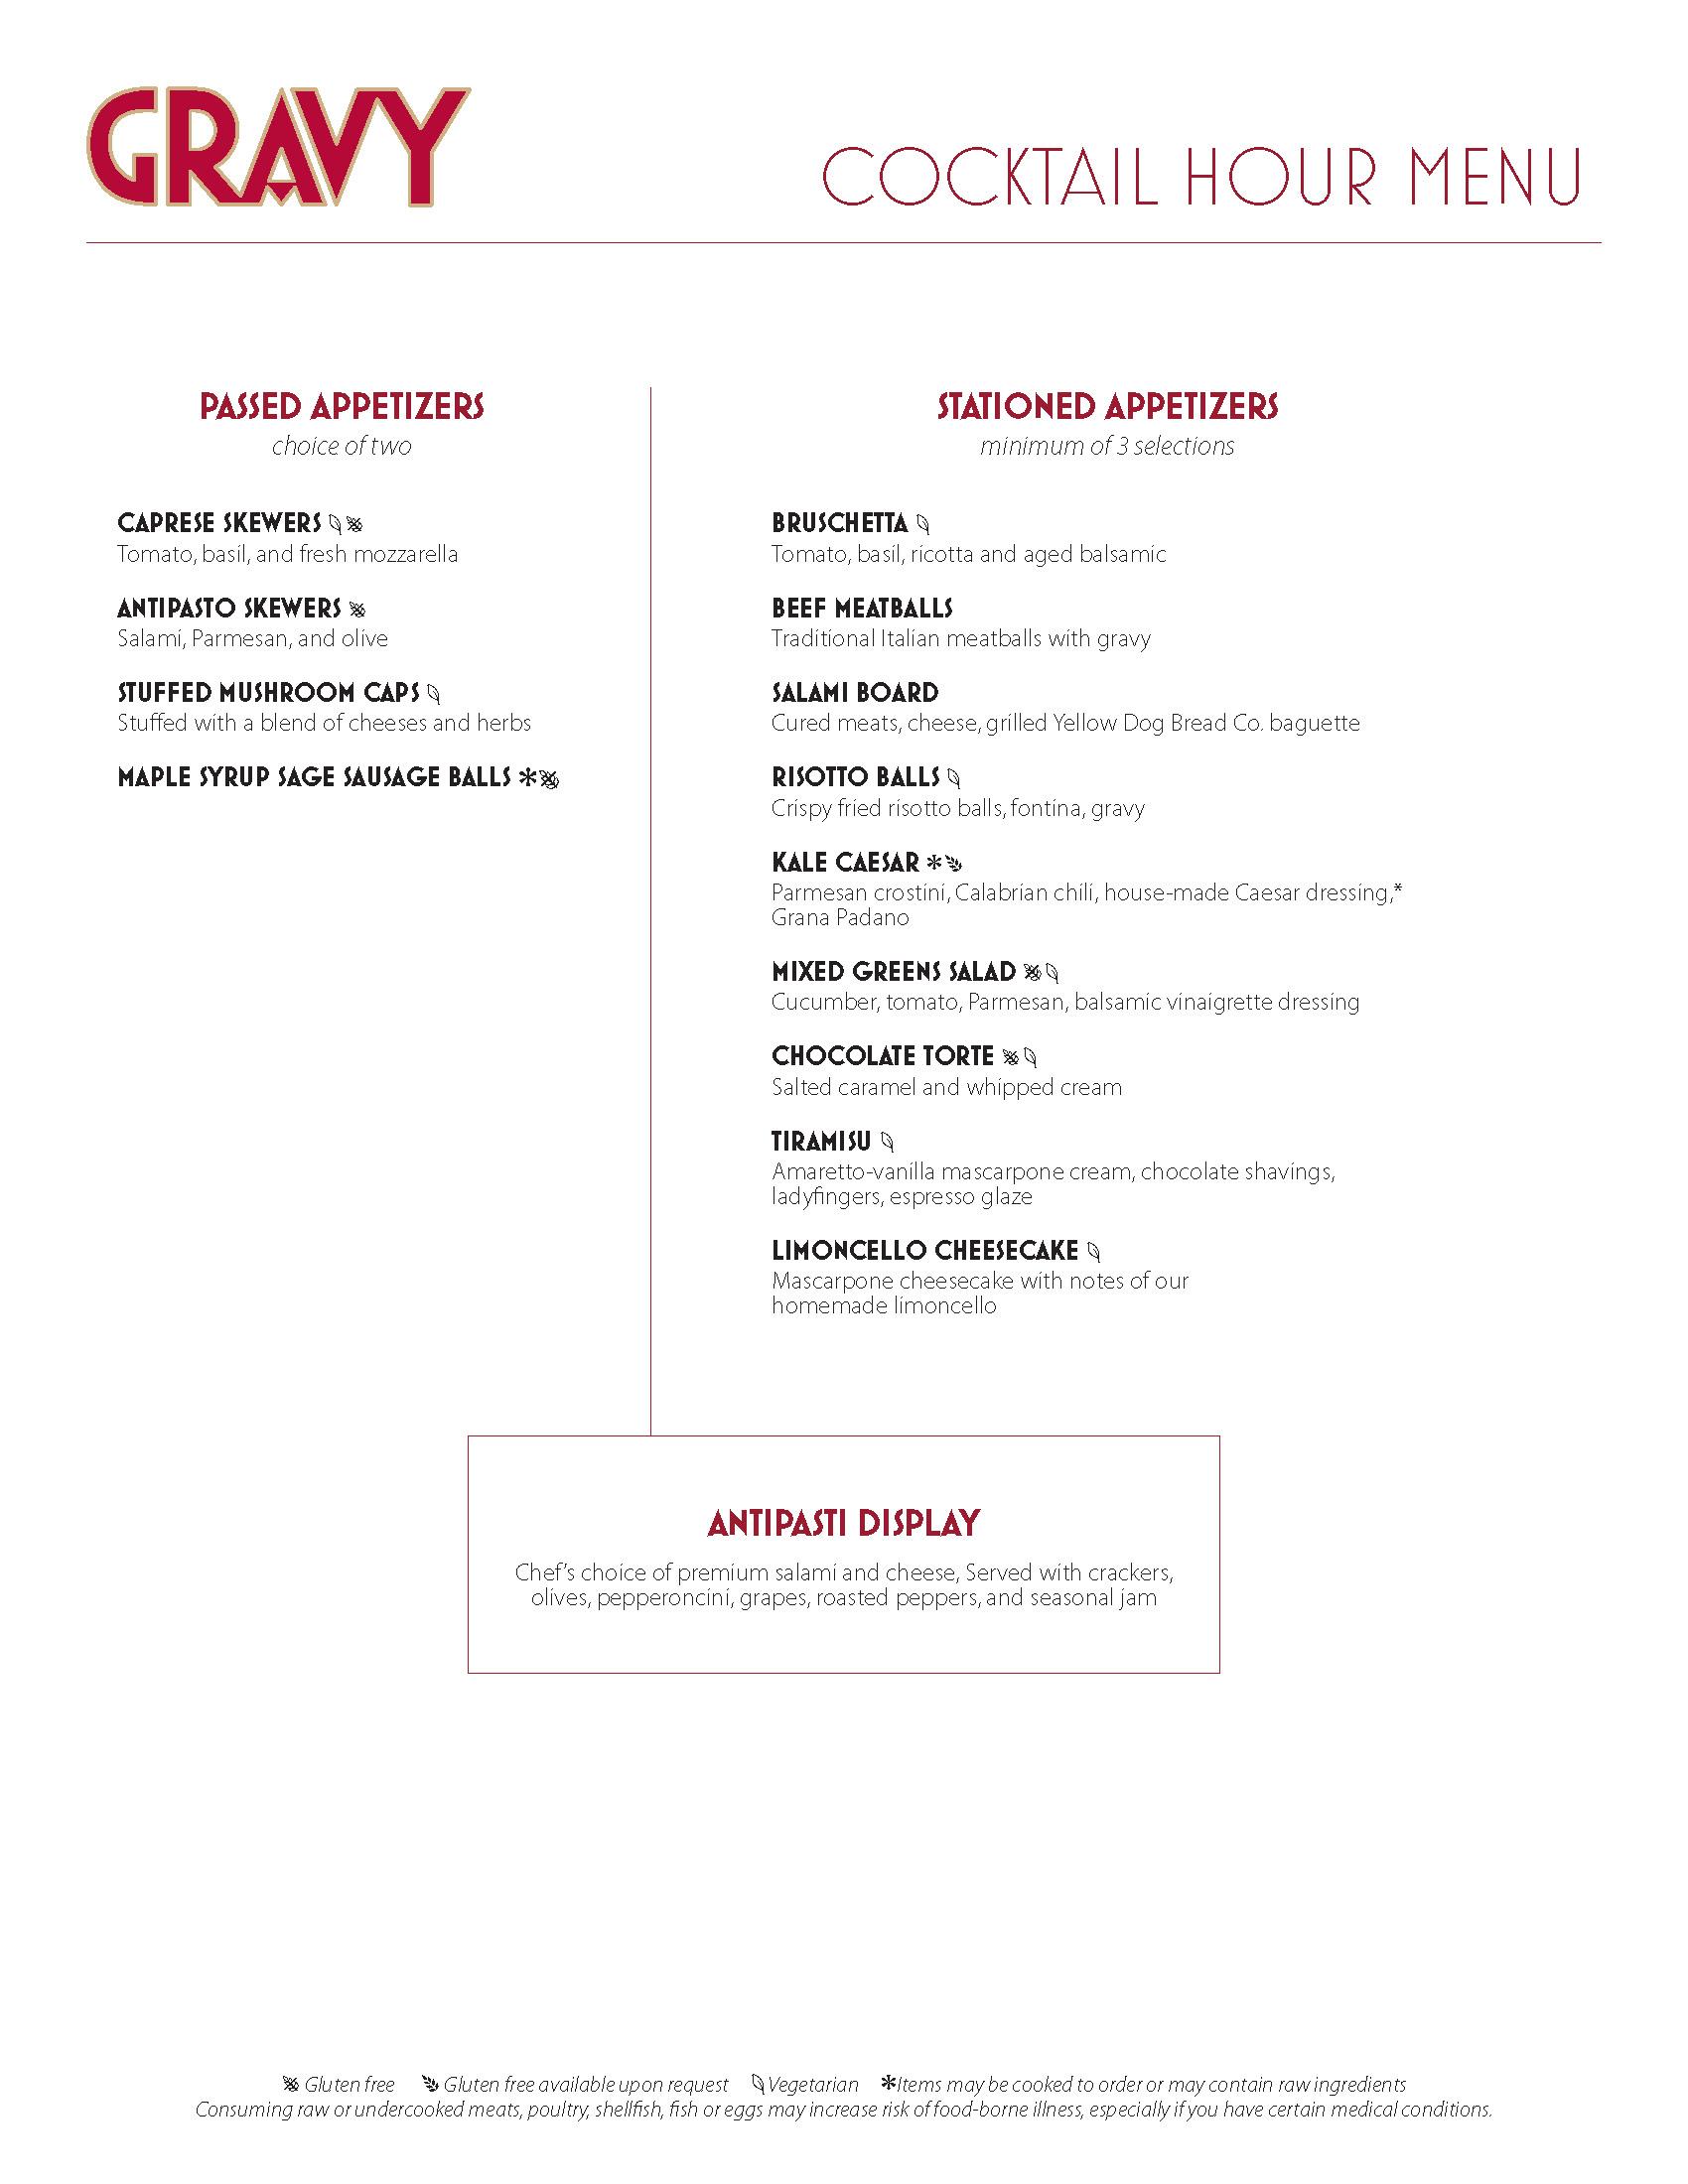 Gravy Hor d'oeuvres menu